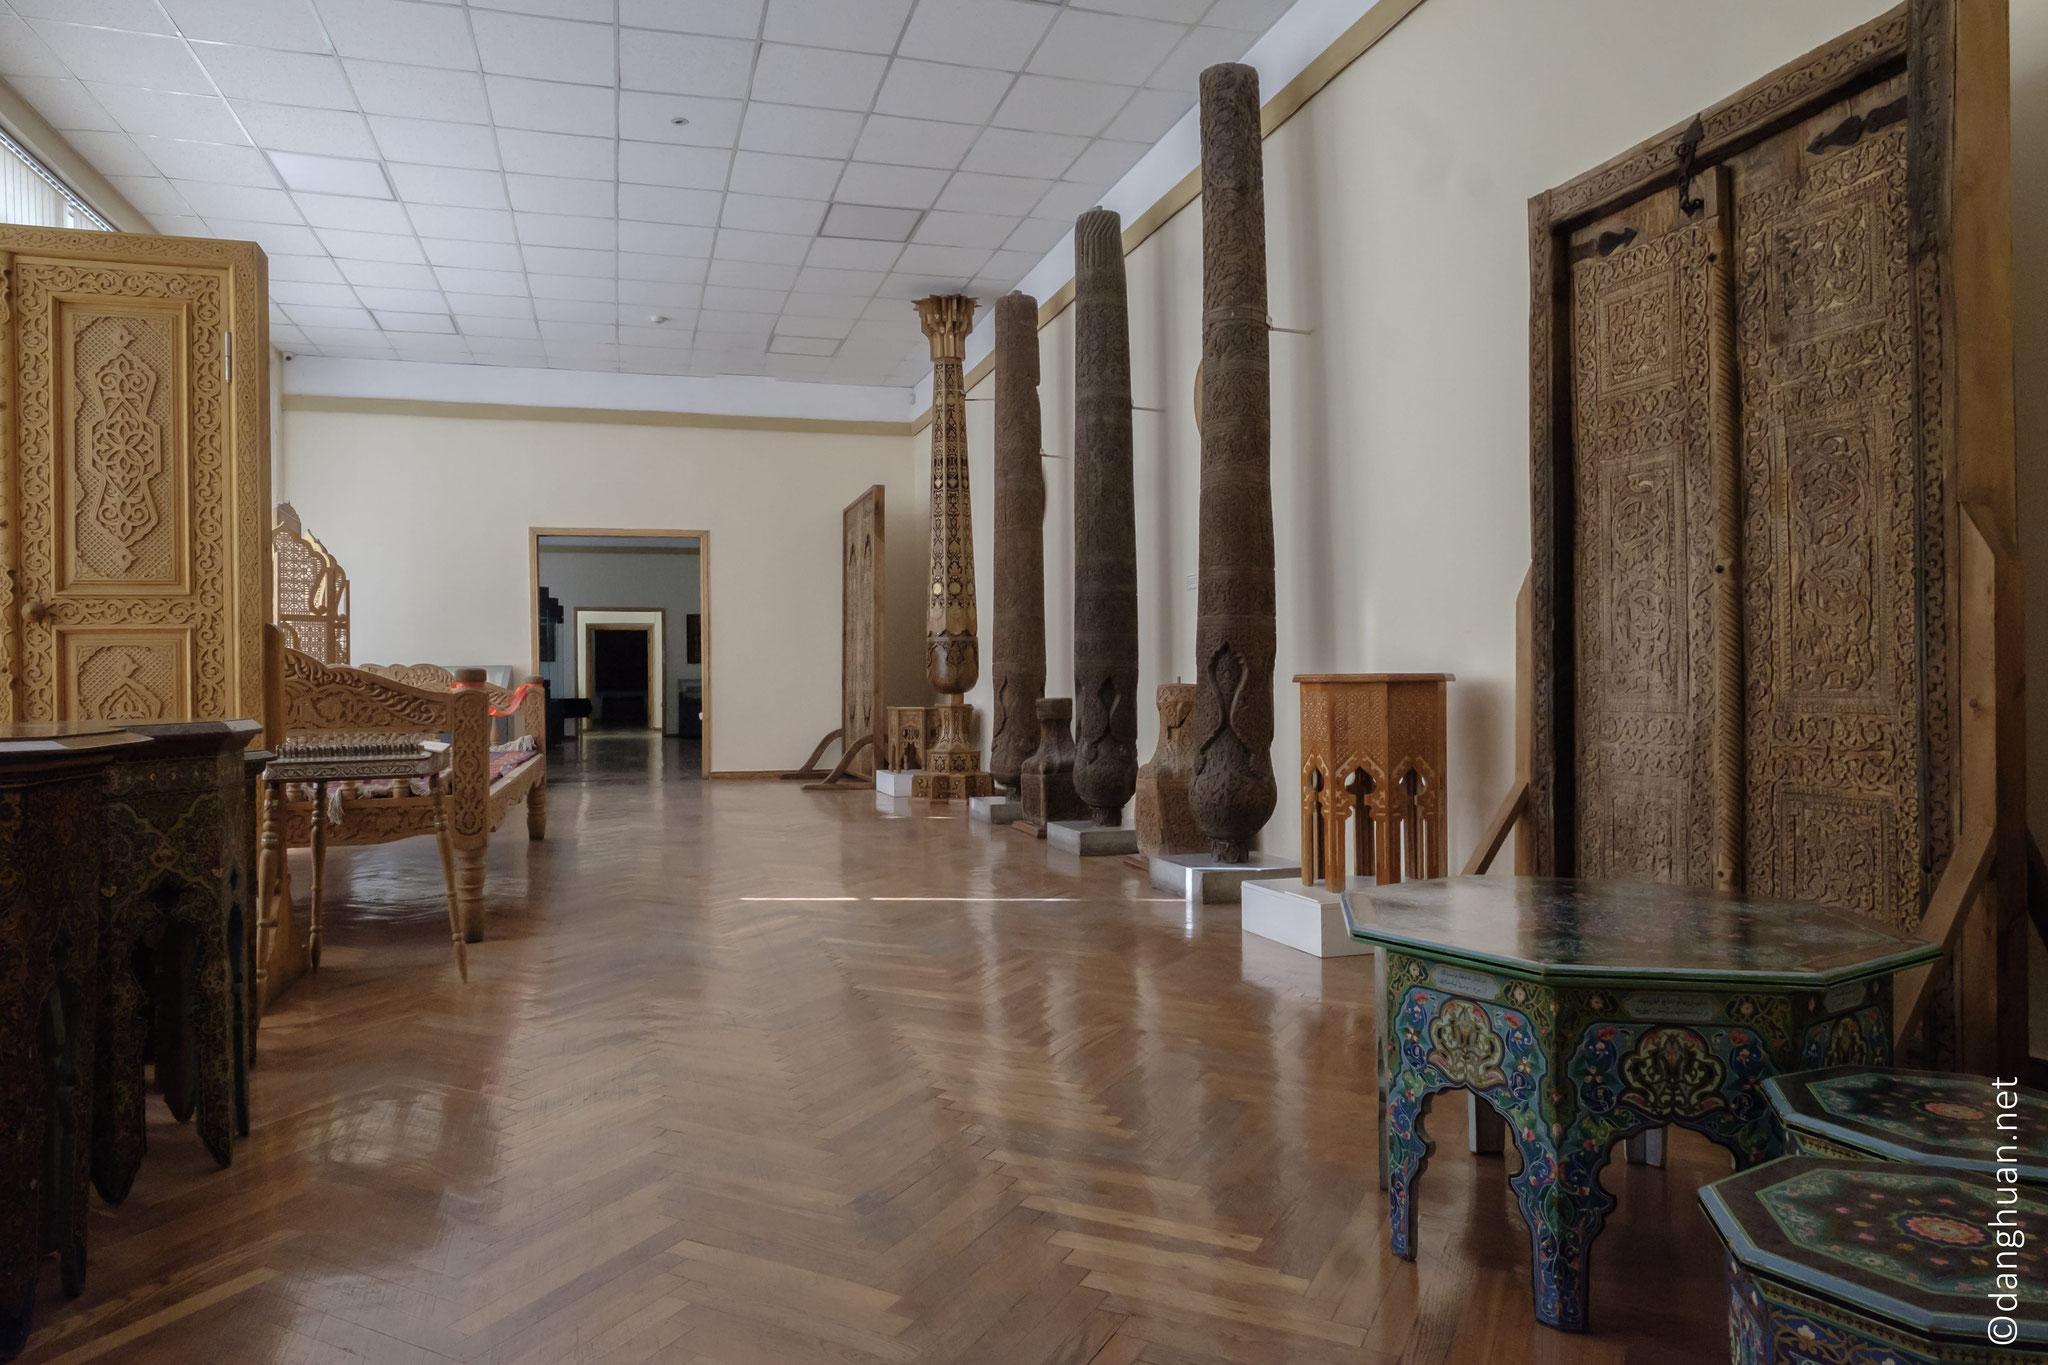 Musée des arts appliqués